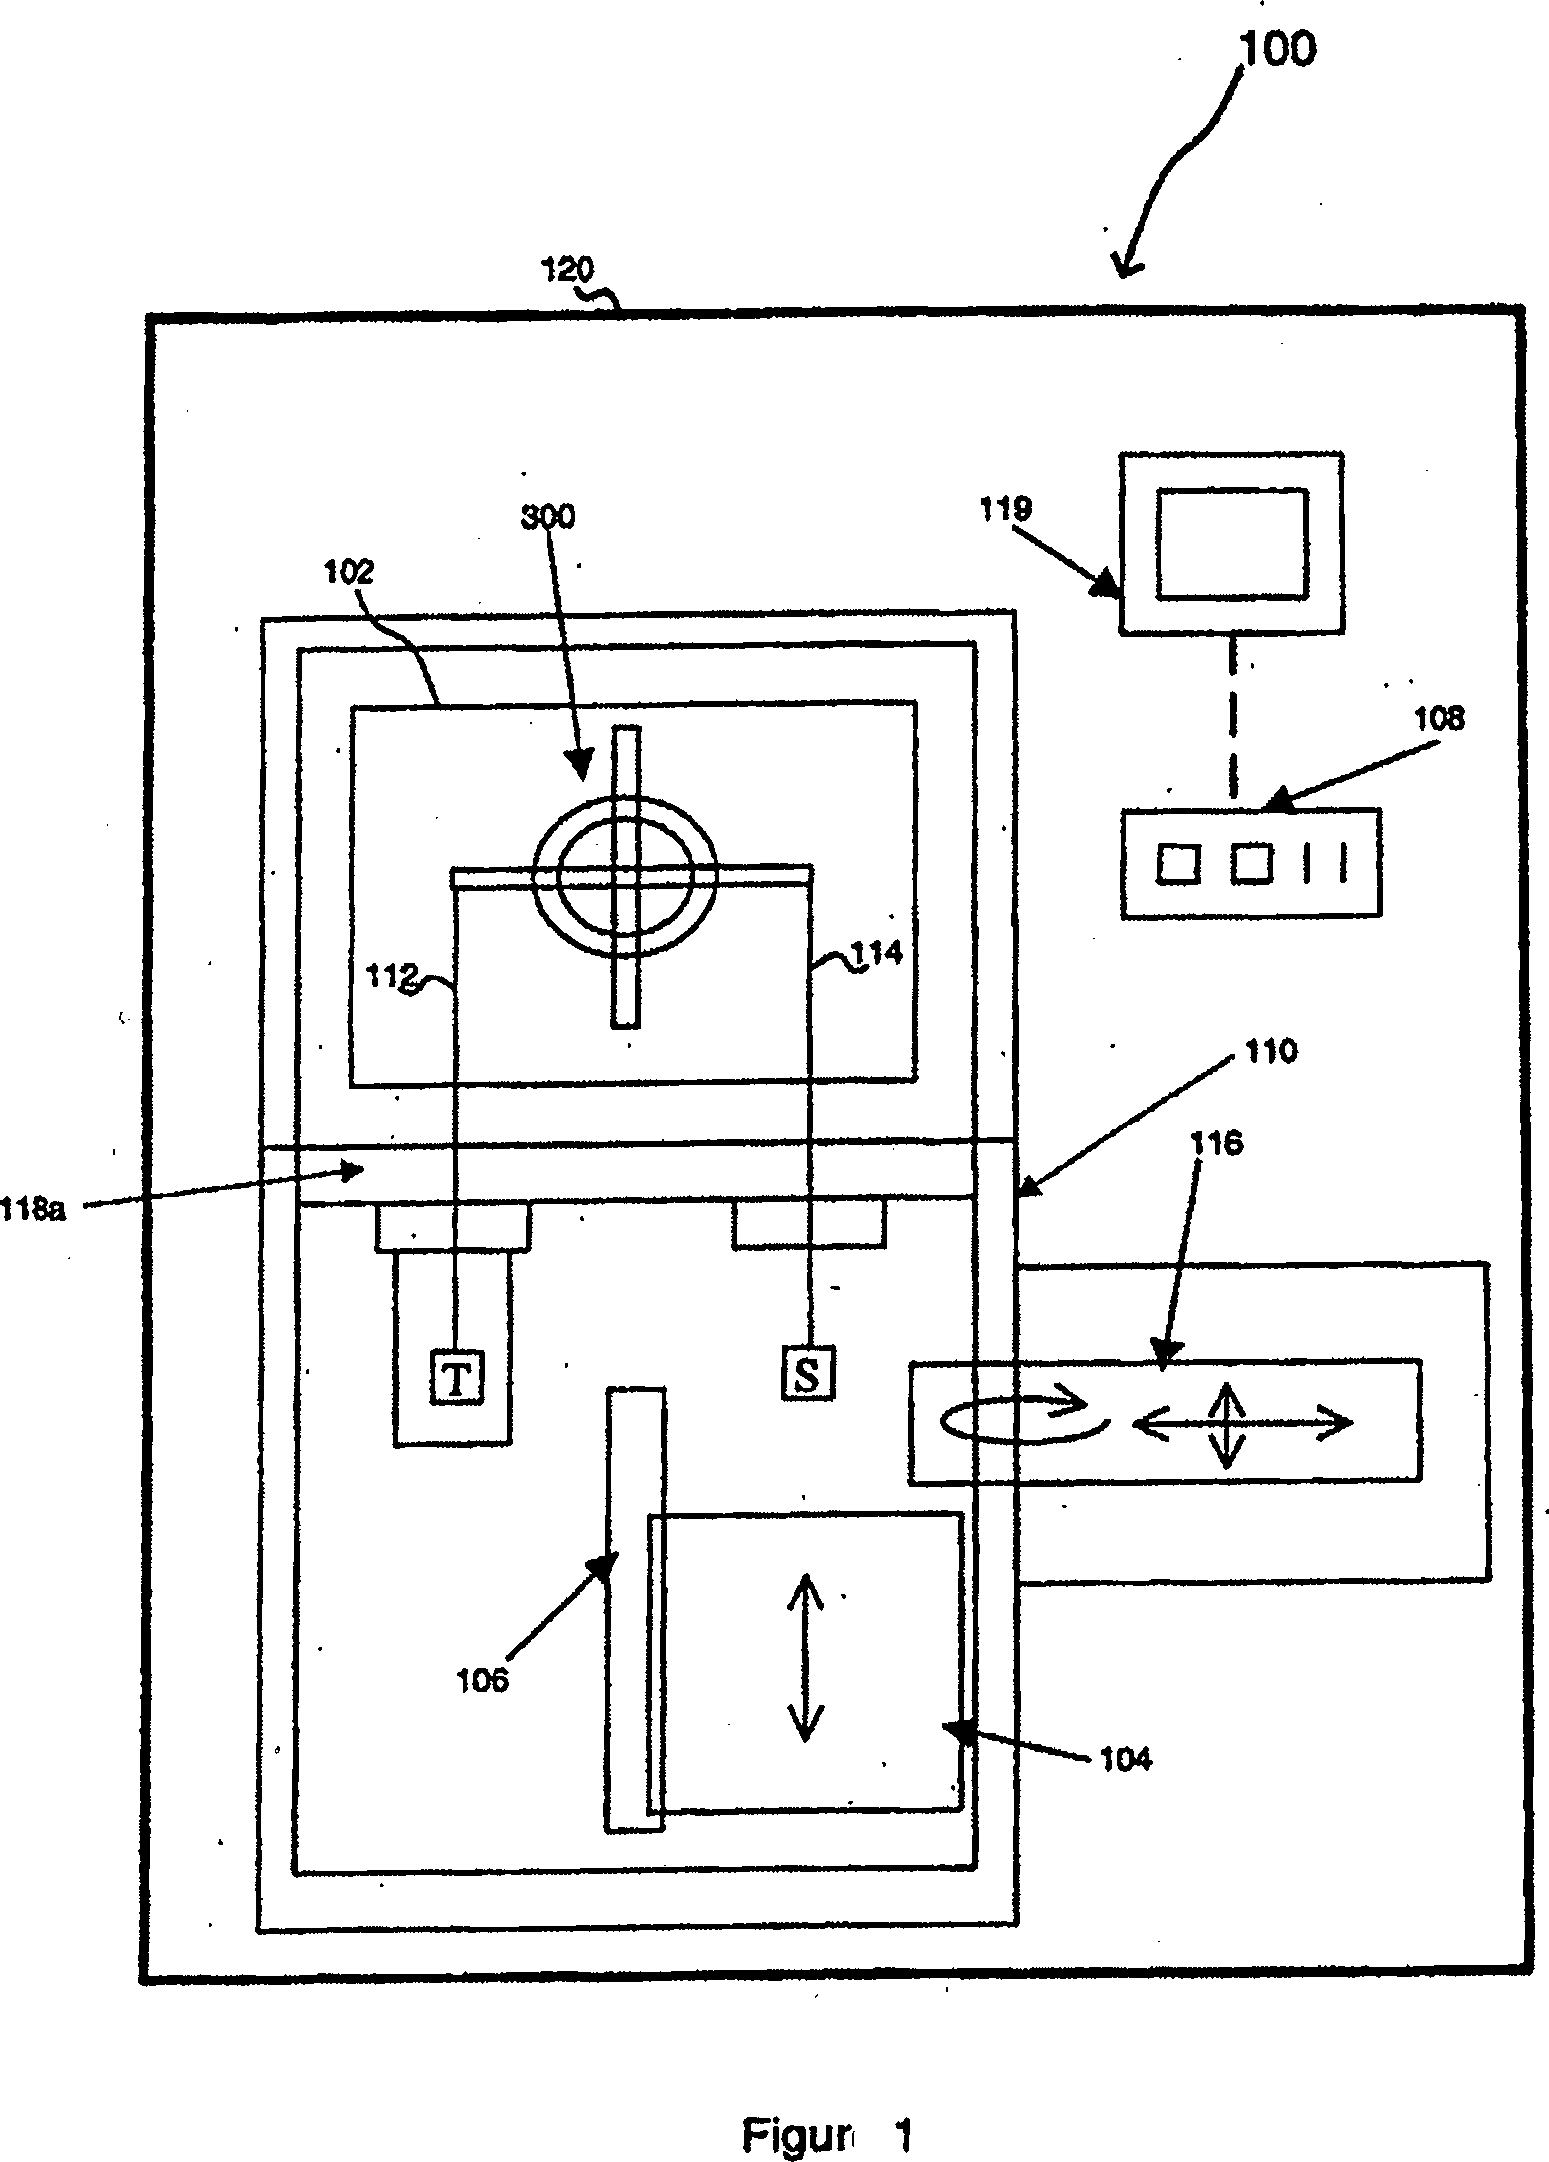 Fein Parallele Zugdrahtspule Fotos - Schaltplan Serie Circuit ...